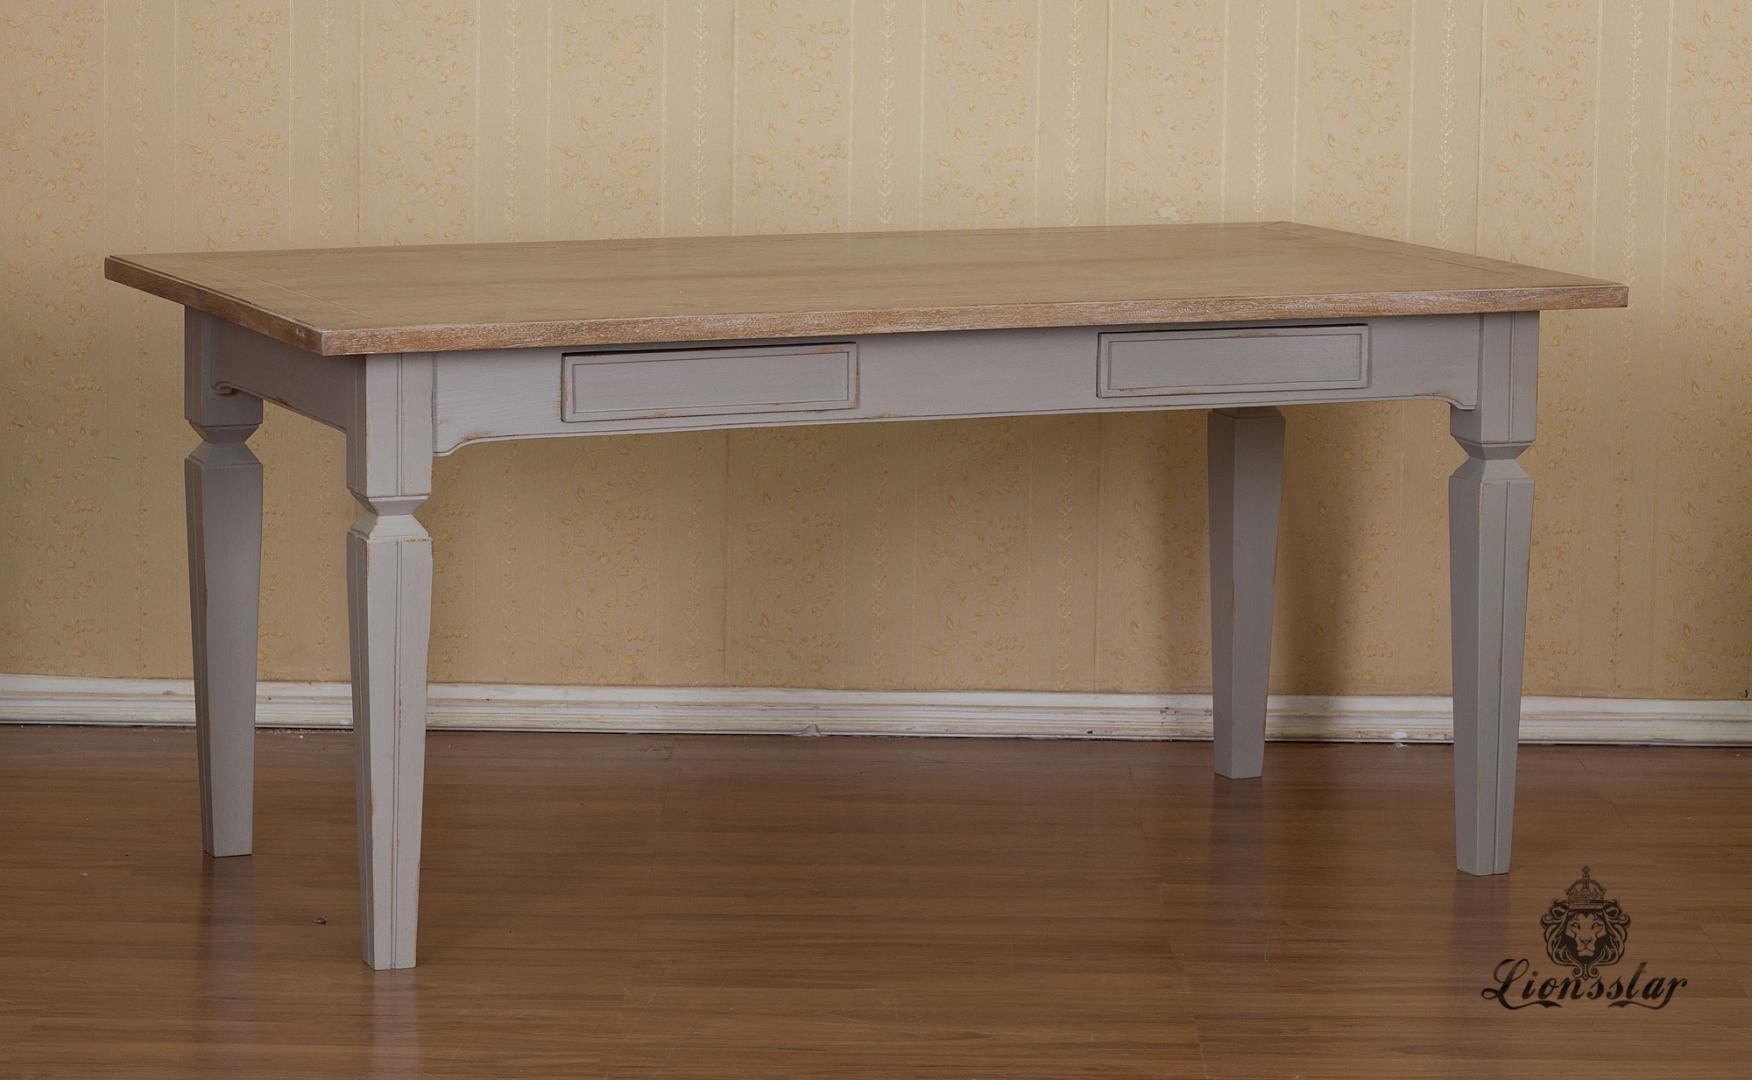 naturholz esstisch marina lionsstar gmbh. Black Bedroom Furniture Sets. Home Design Ideas